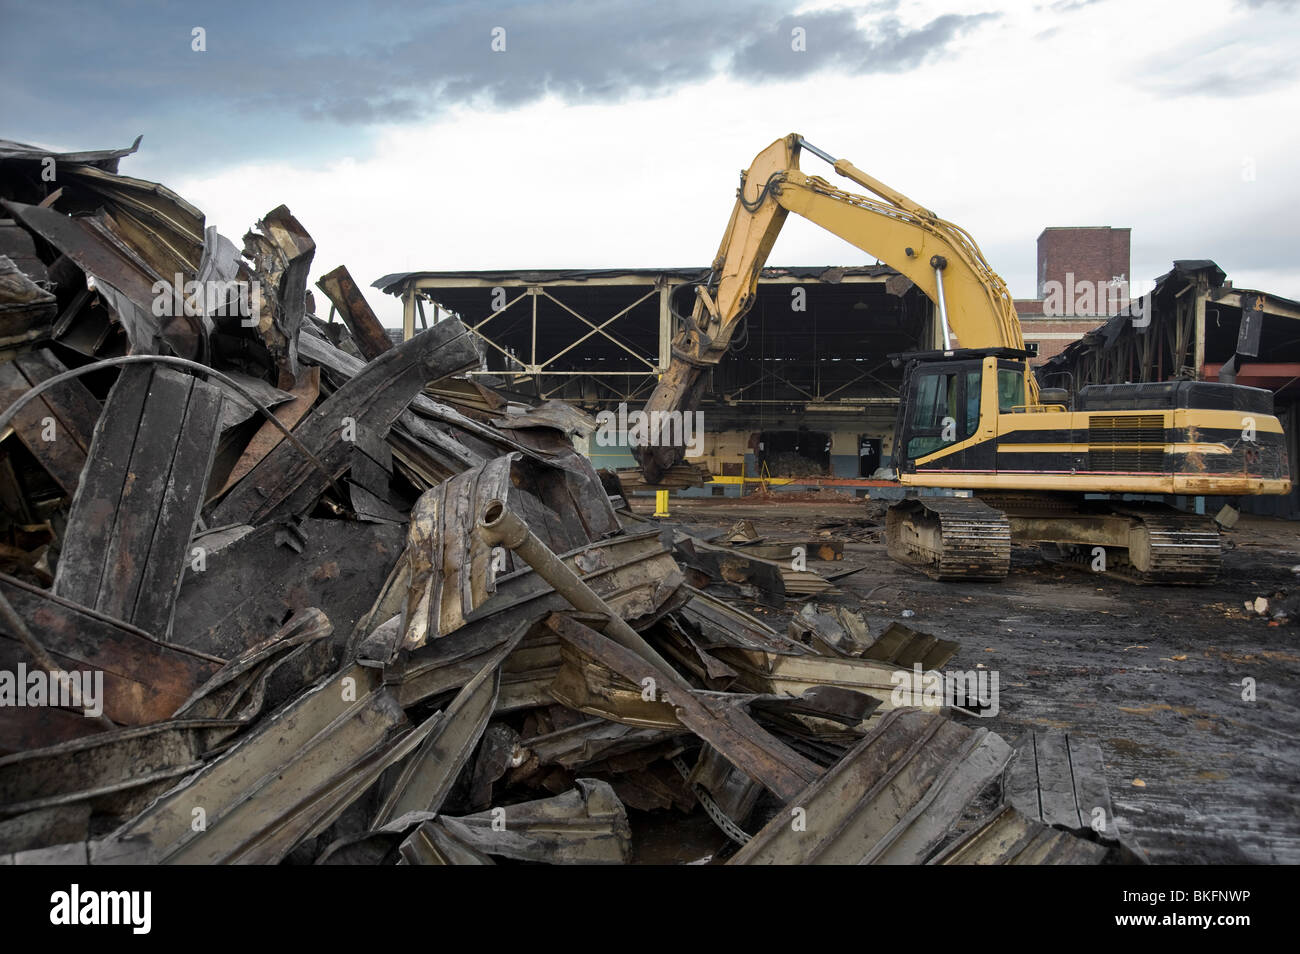 Scrap Metal Pile & Heavy Machinery Construction Equipment At Demolition Site, Philadelphia, USA - Stock Image